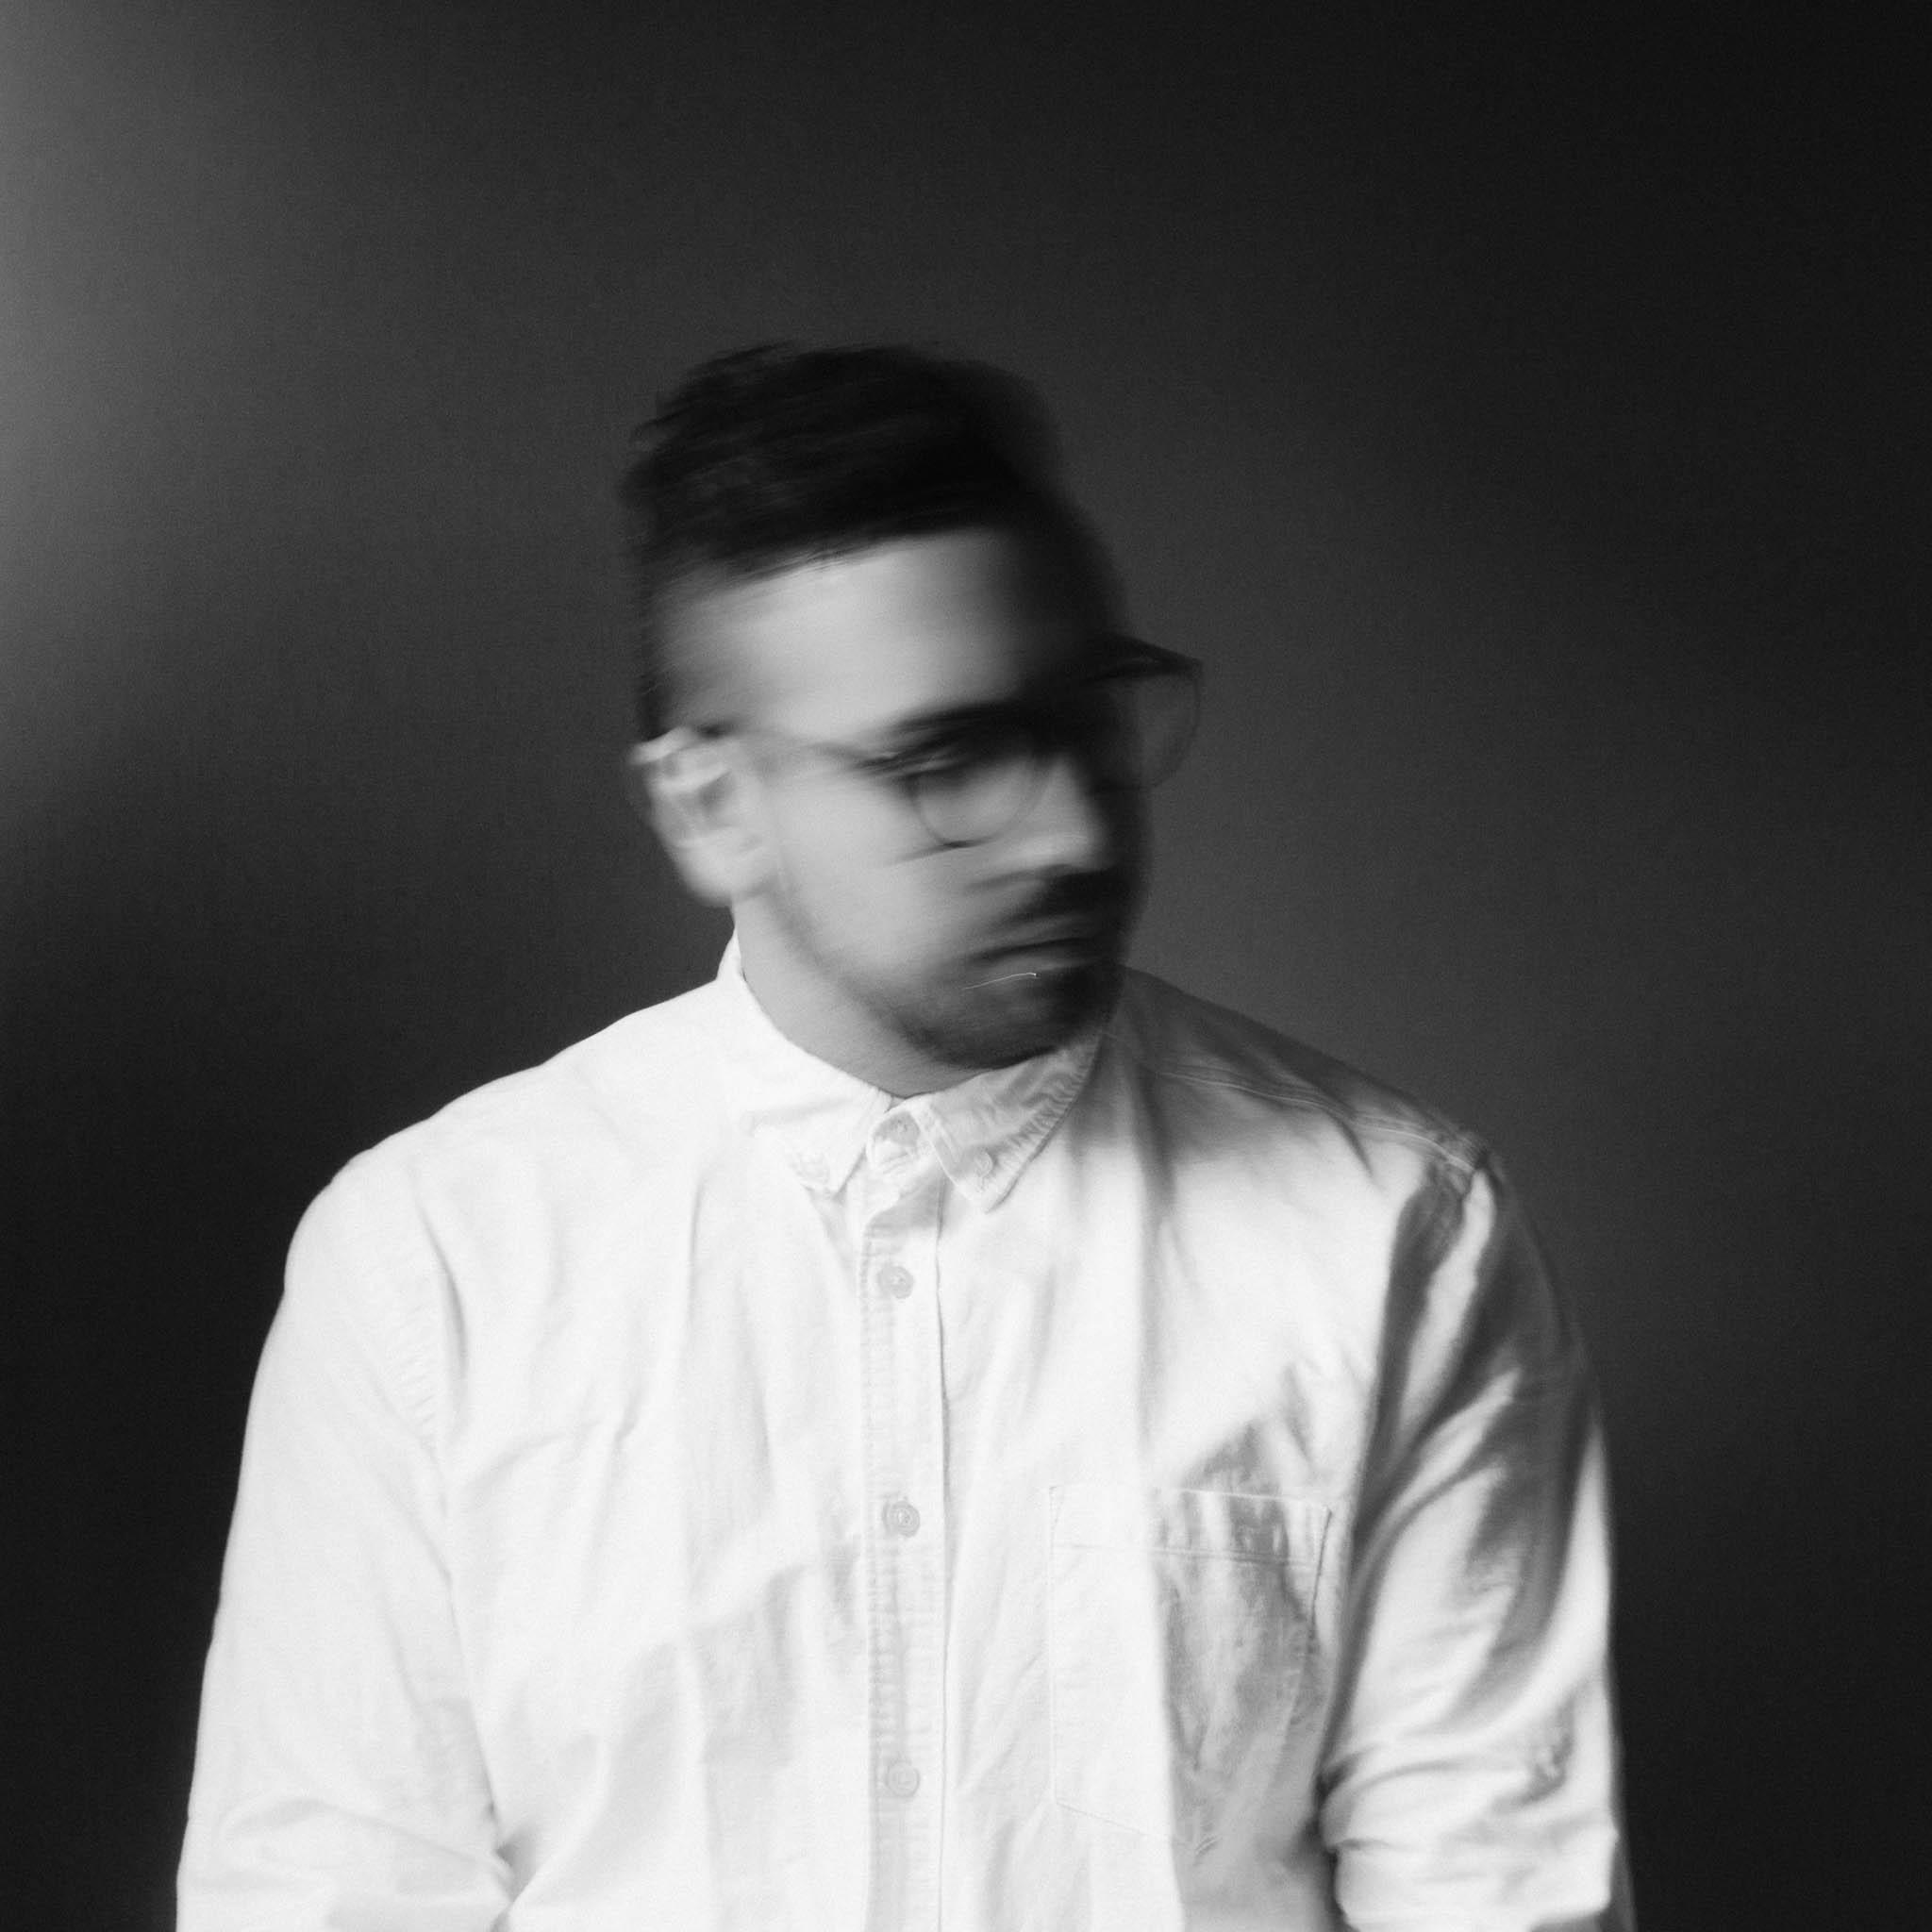 levi-self-portrait-1-12.jpg